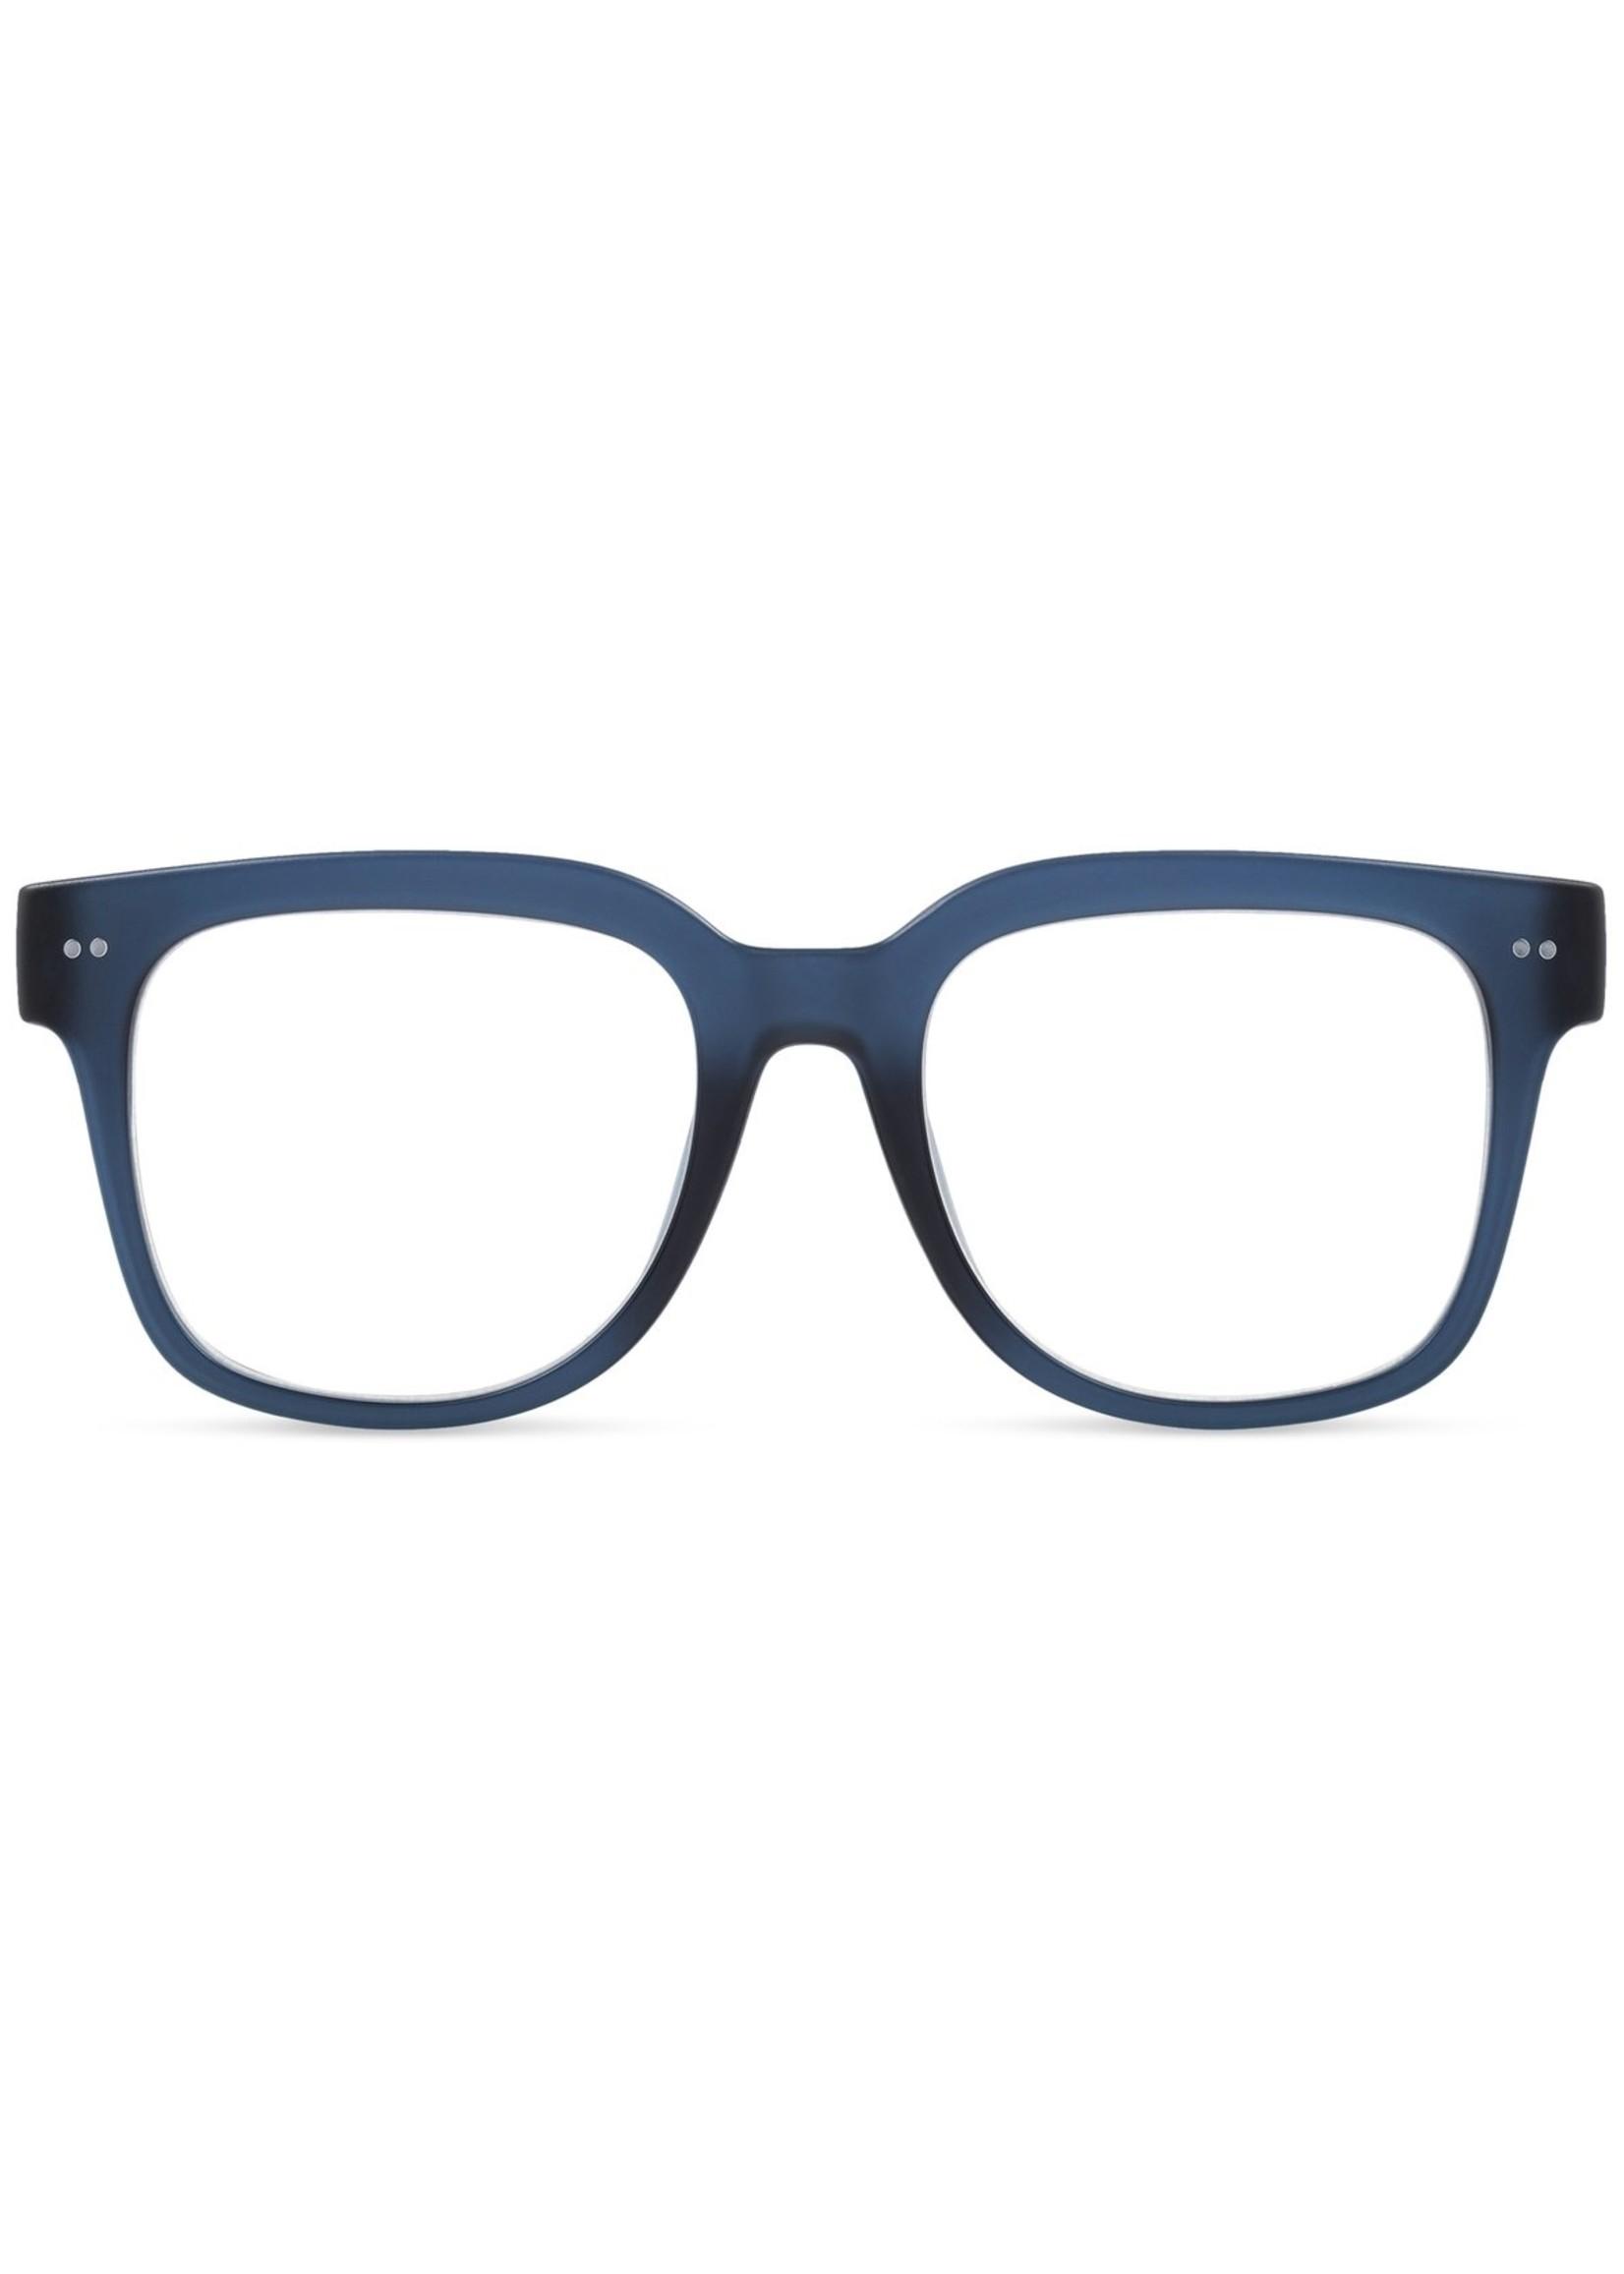 Look Optic Laurel Screen Readers